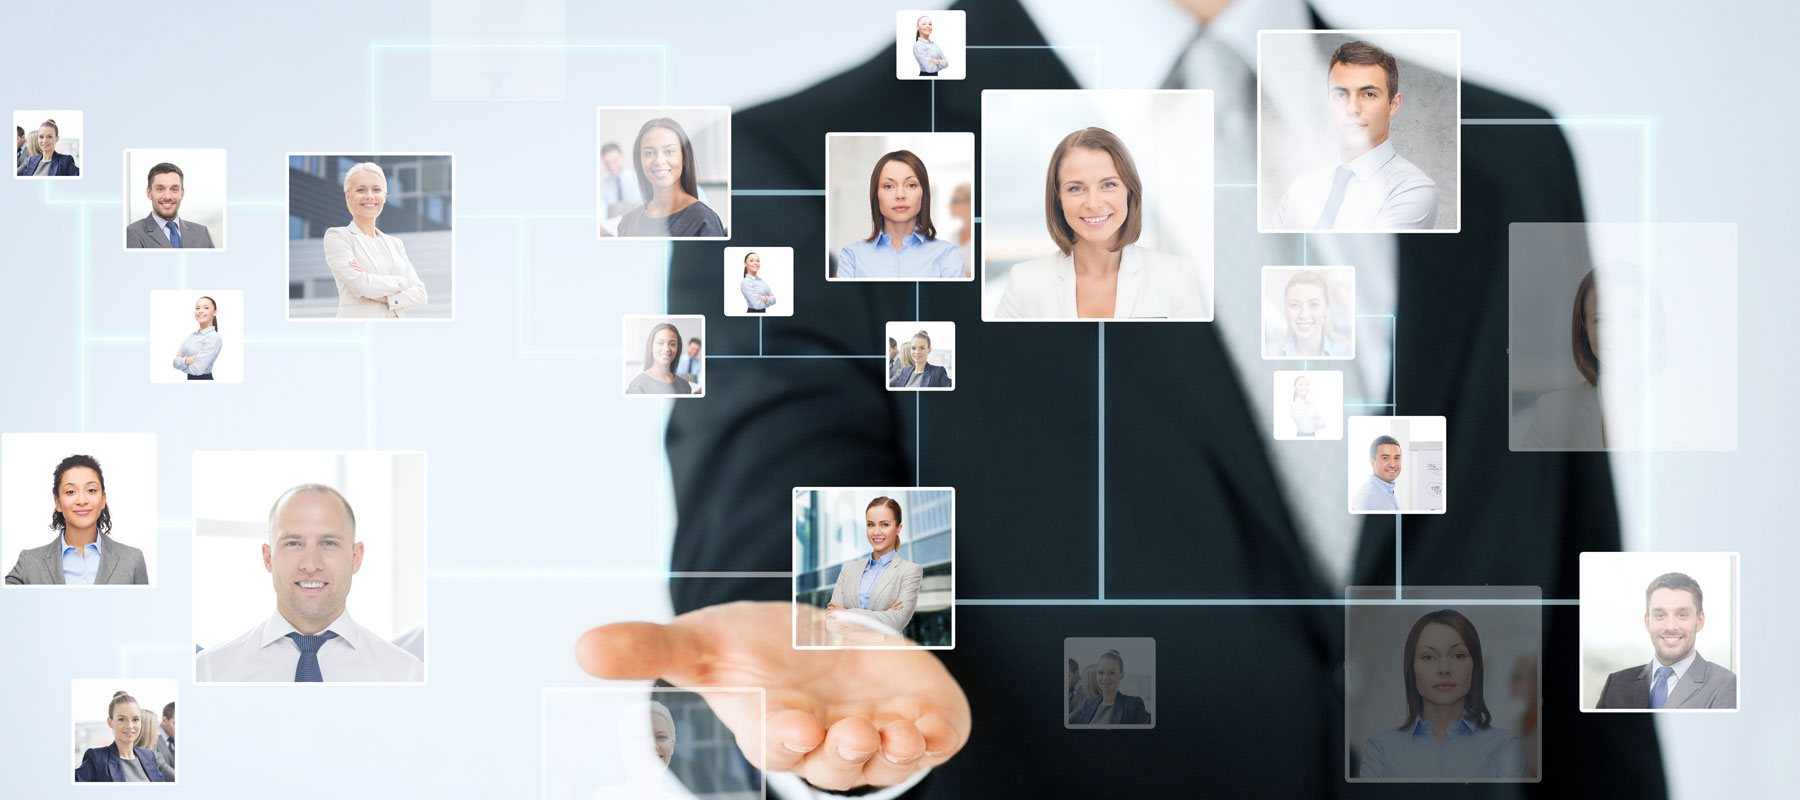 Recrutement et services ressources humaines